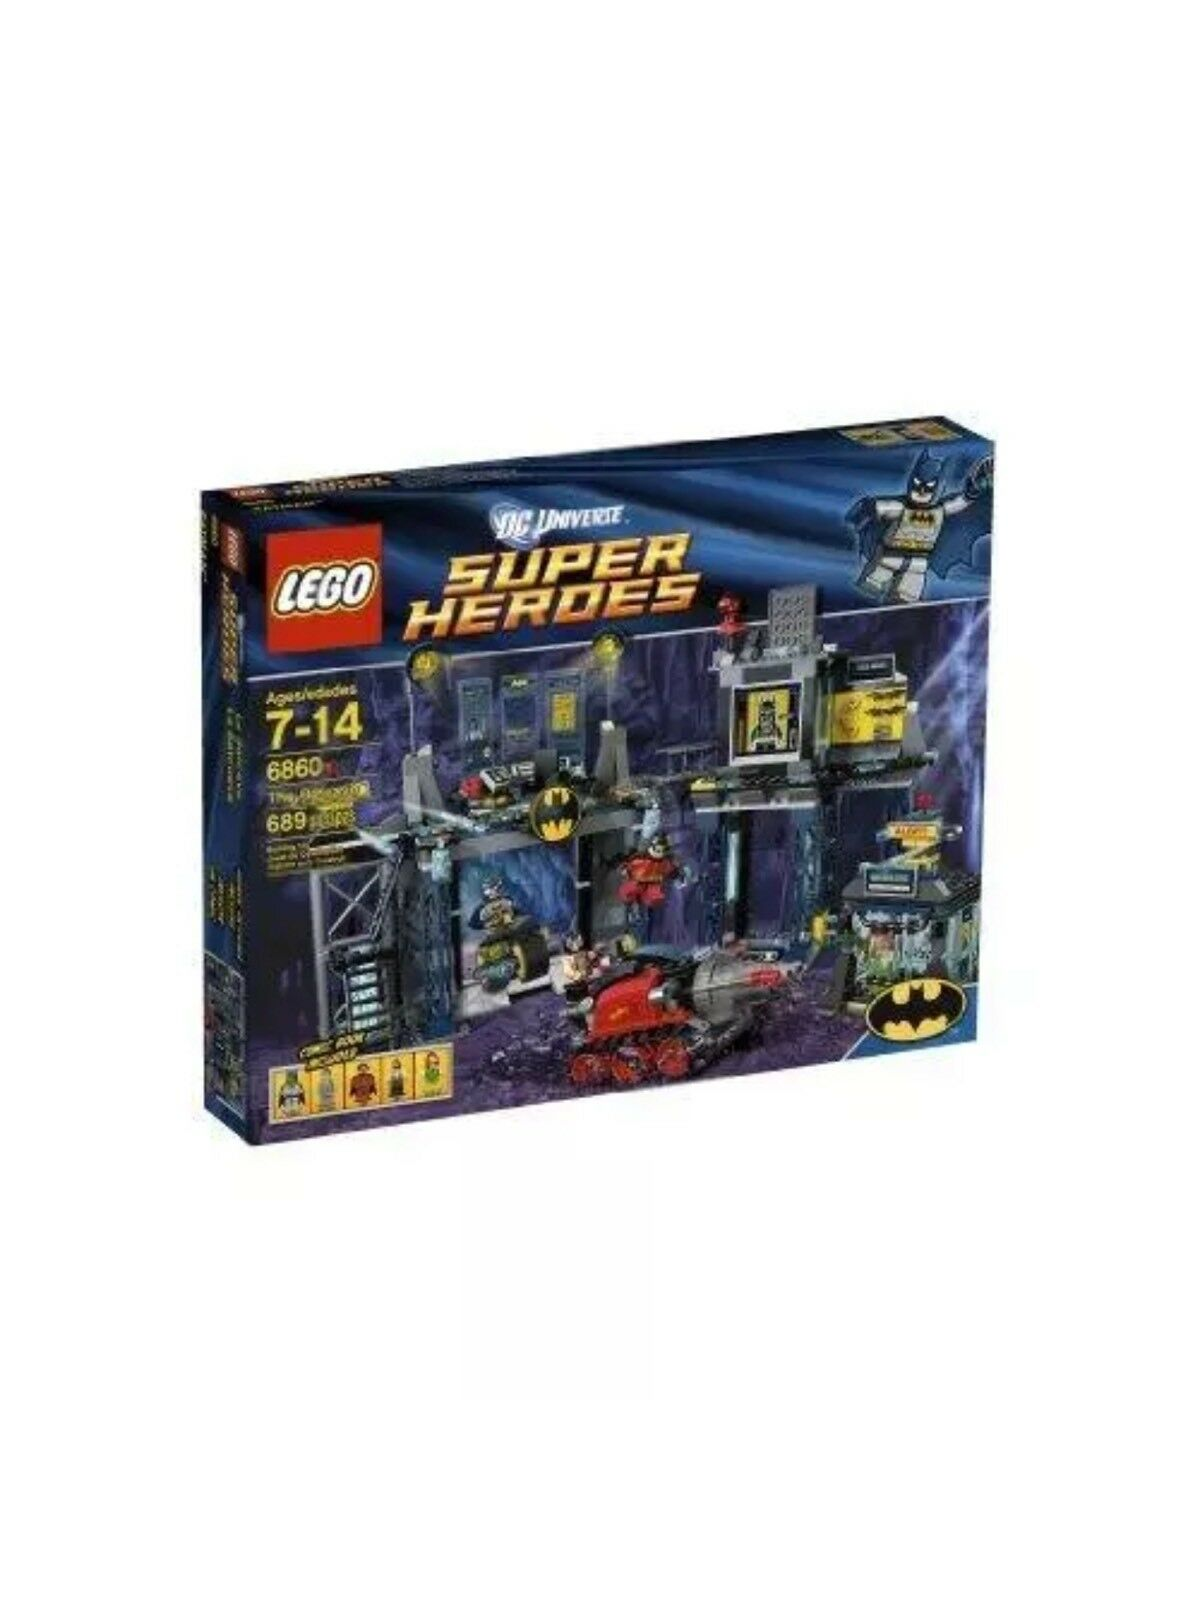 LEGO Super Heroes 6860 The Batcave Batman New Sealed RetiROT